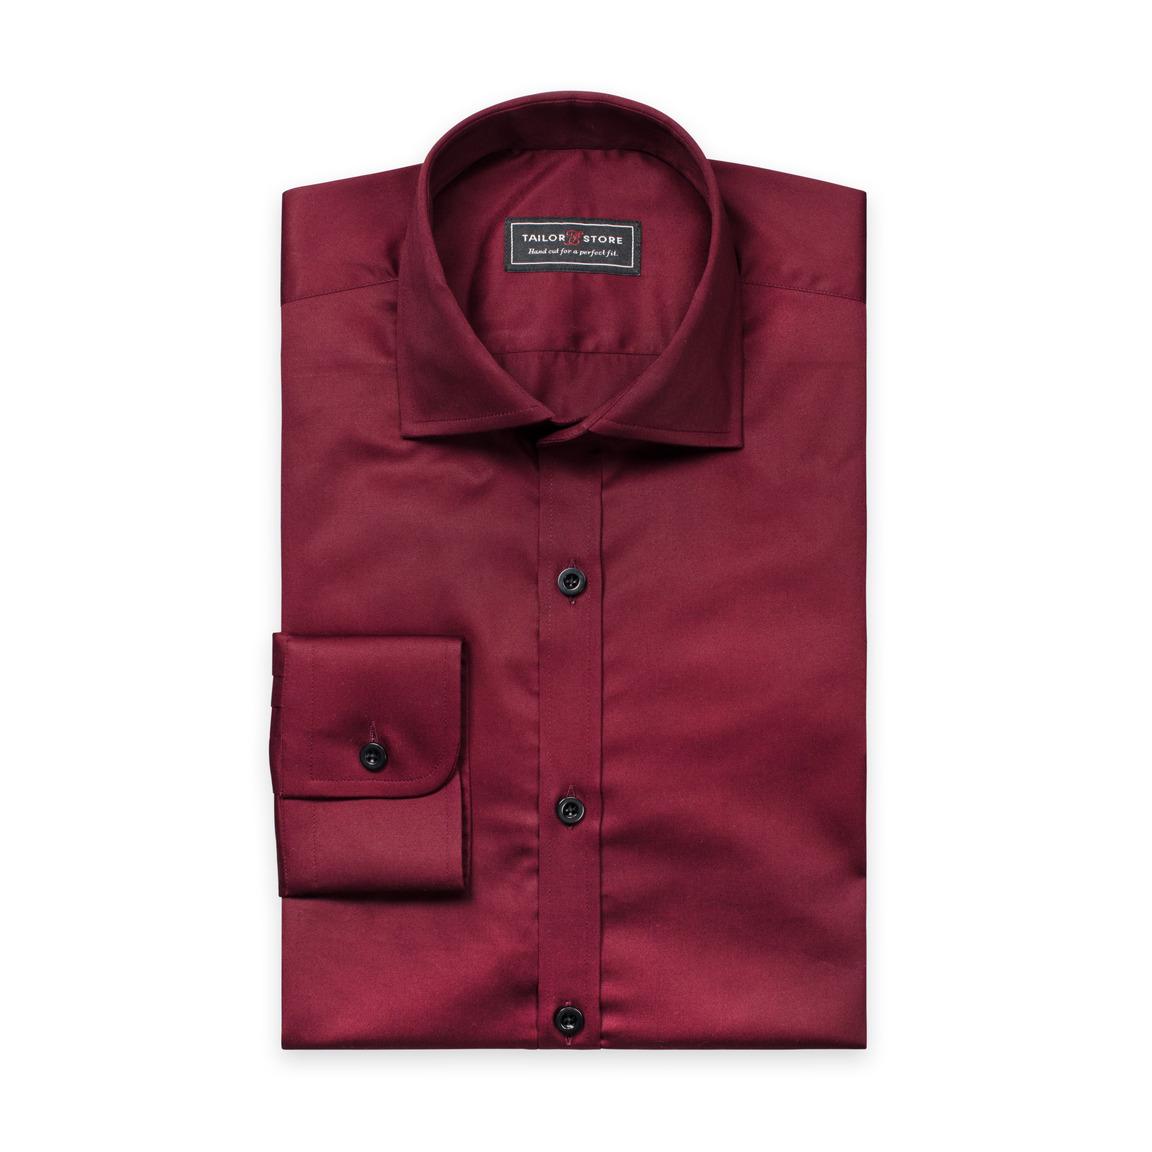 Burgundy cotton satin shirt